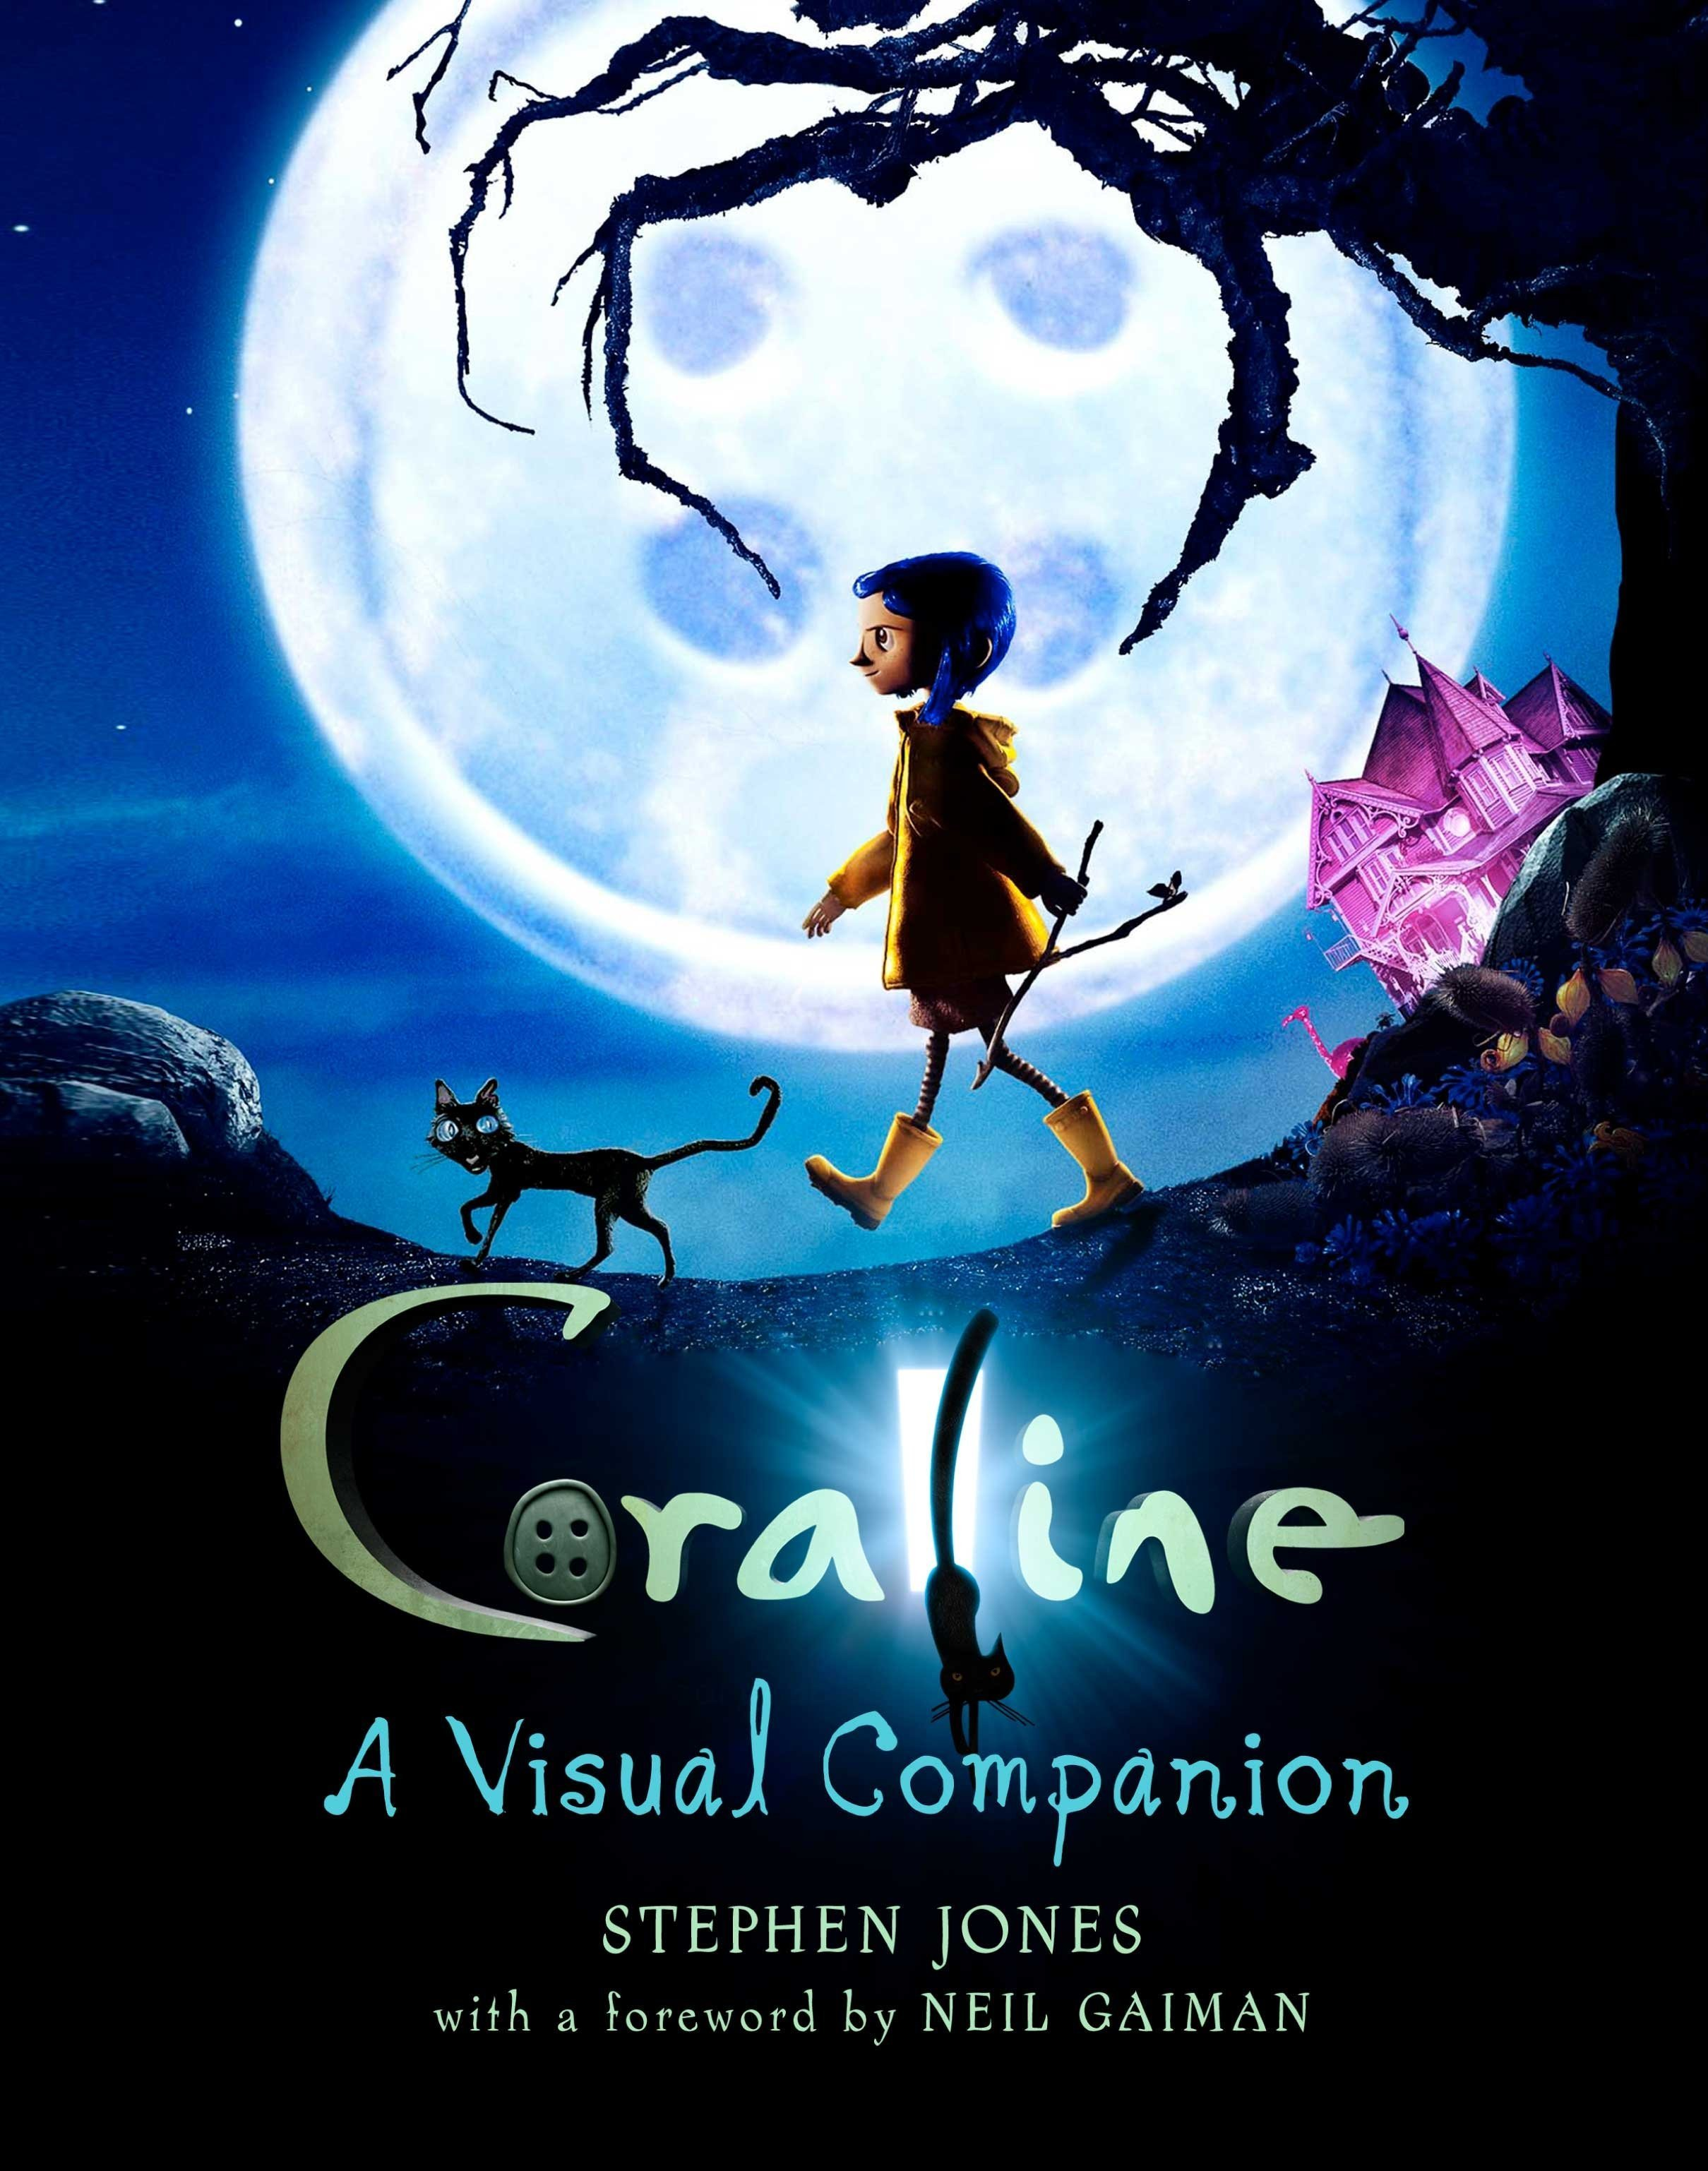 coraline 2009 poster freemoviepostersnet